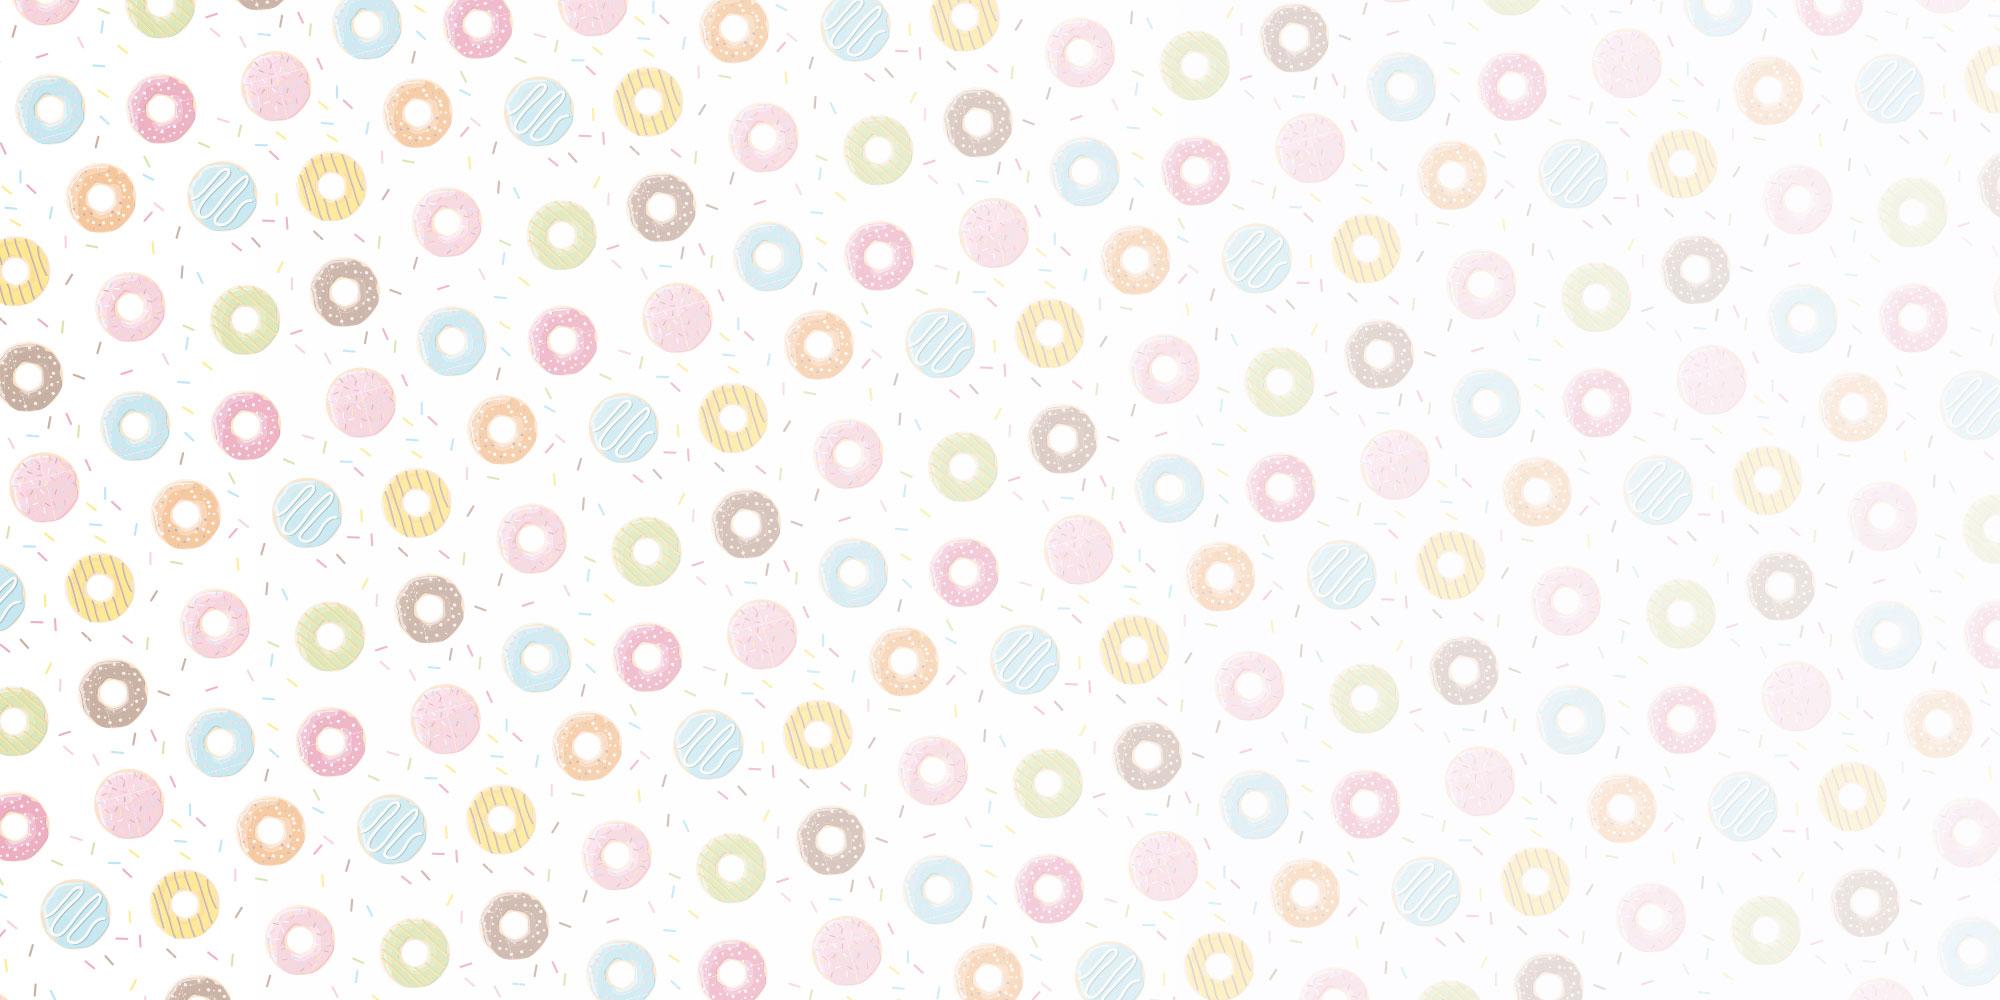 BG-factory-pattern